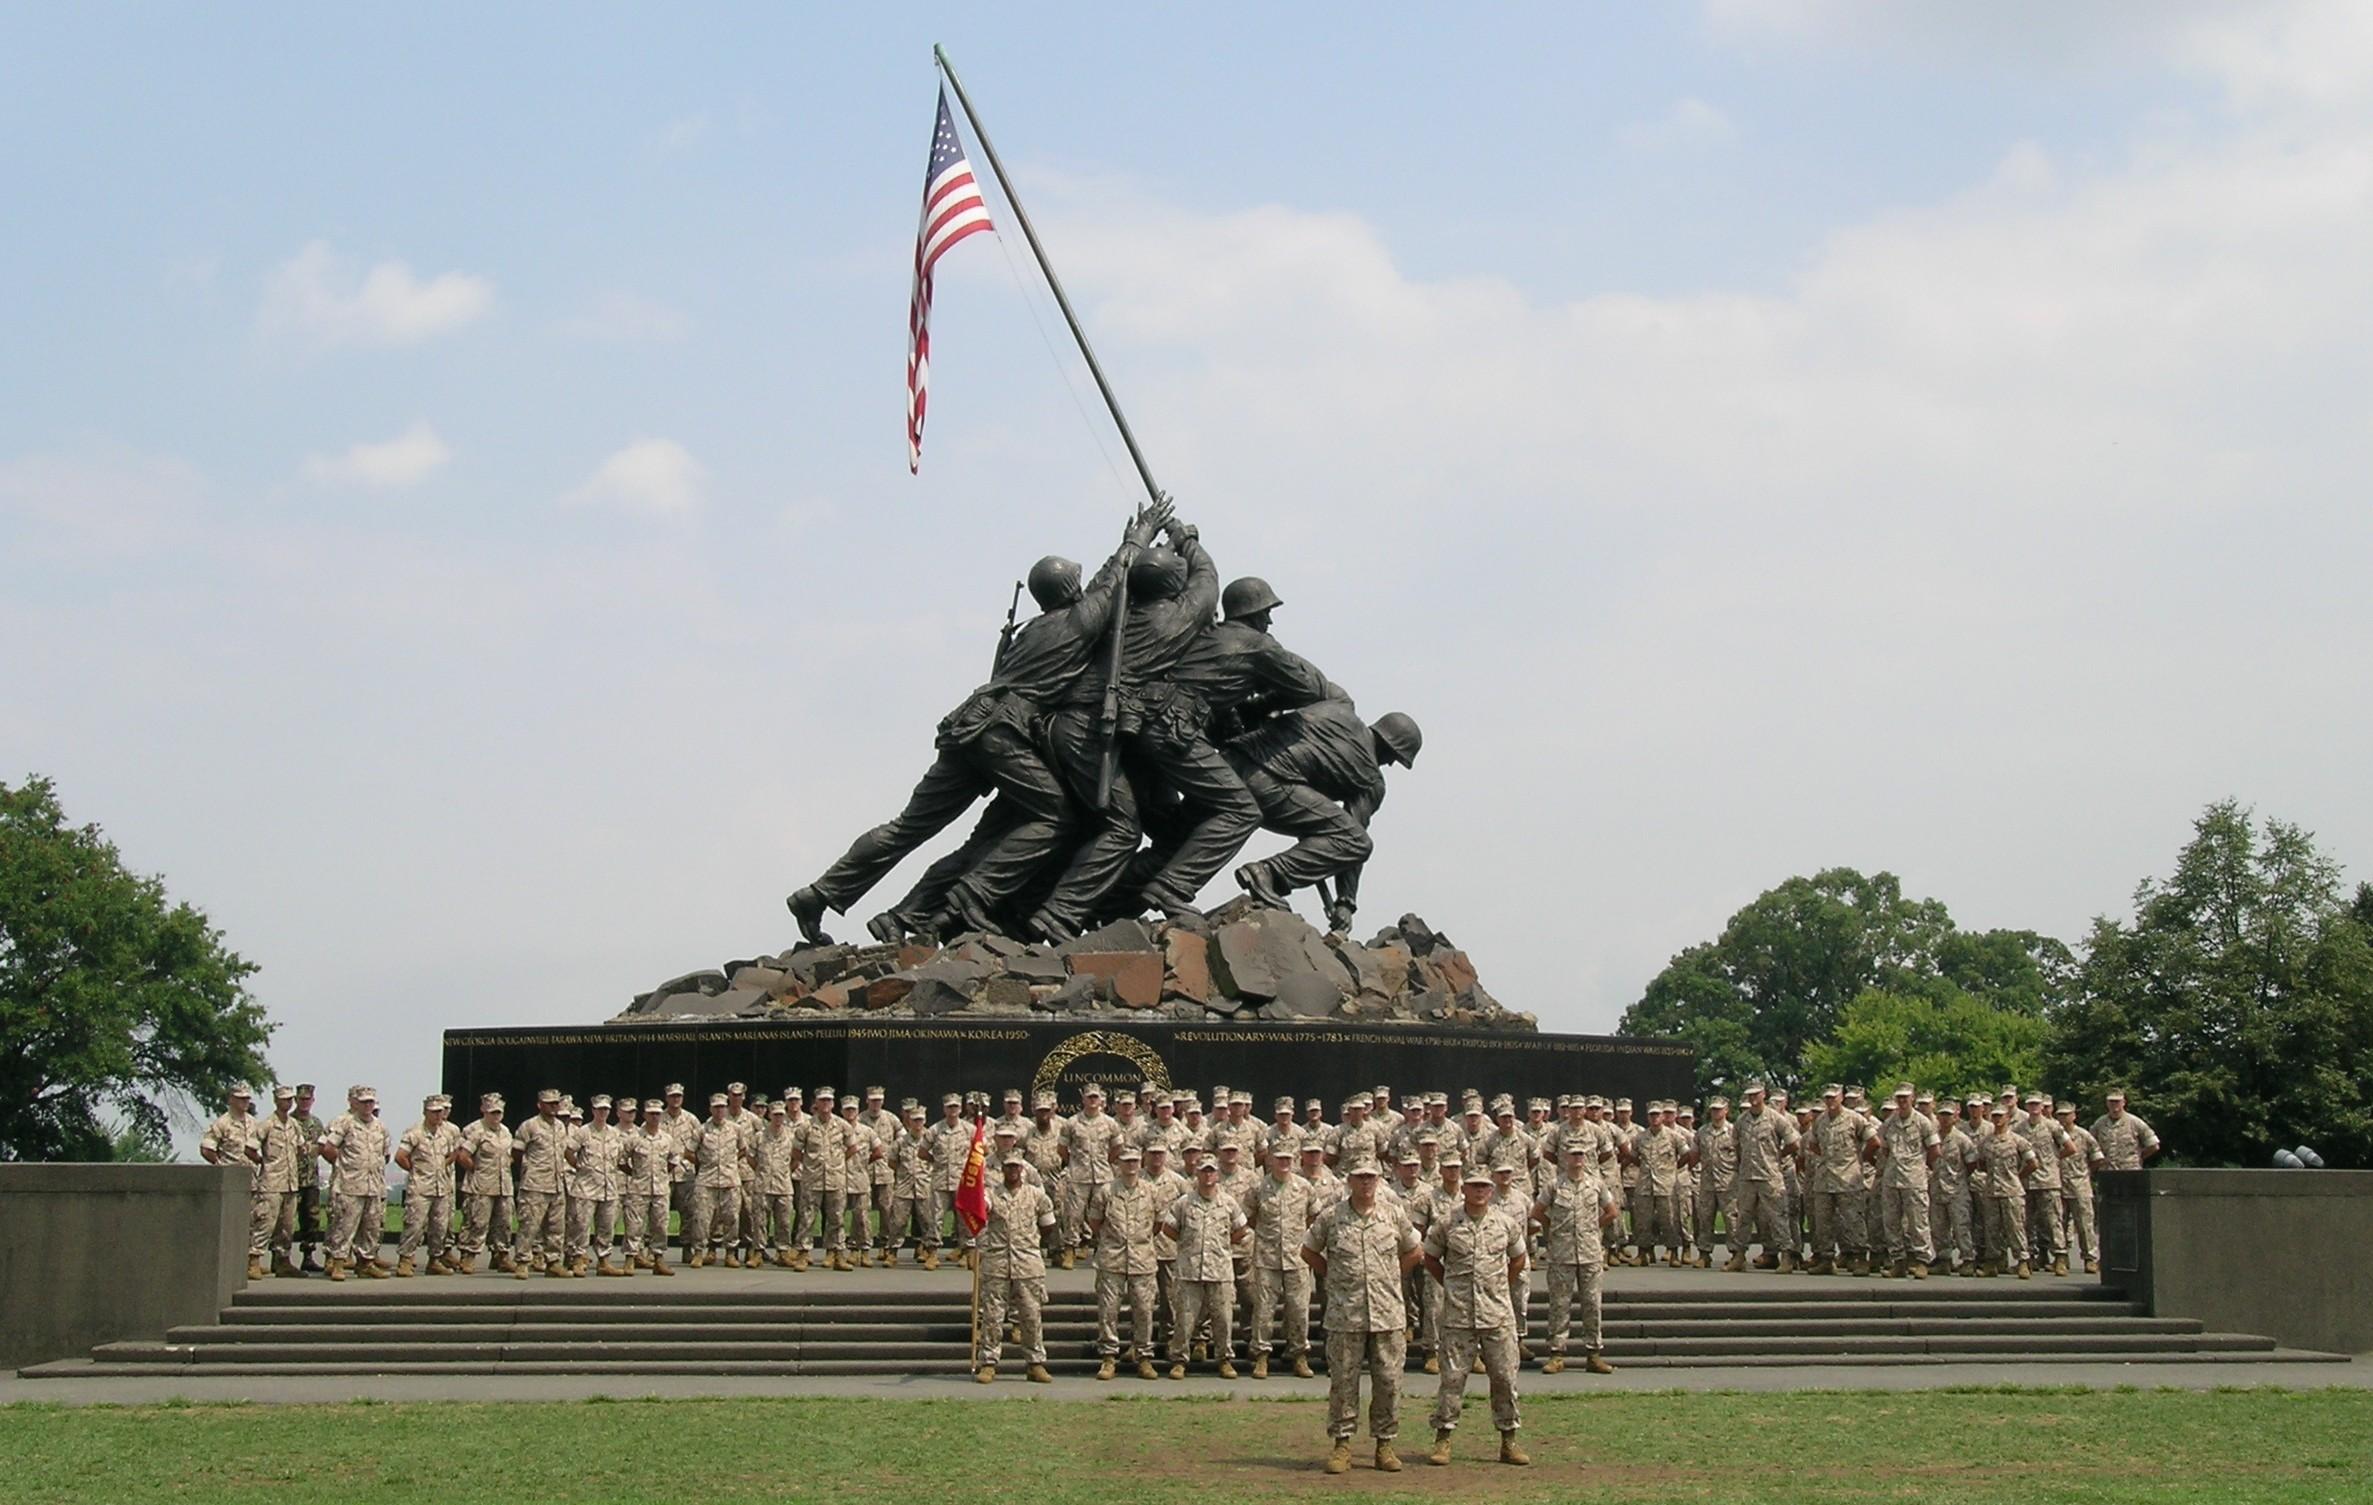 Pictures of War Memorials in Washington dc War Memorial Washington